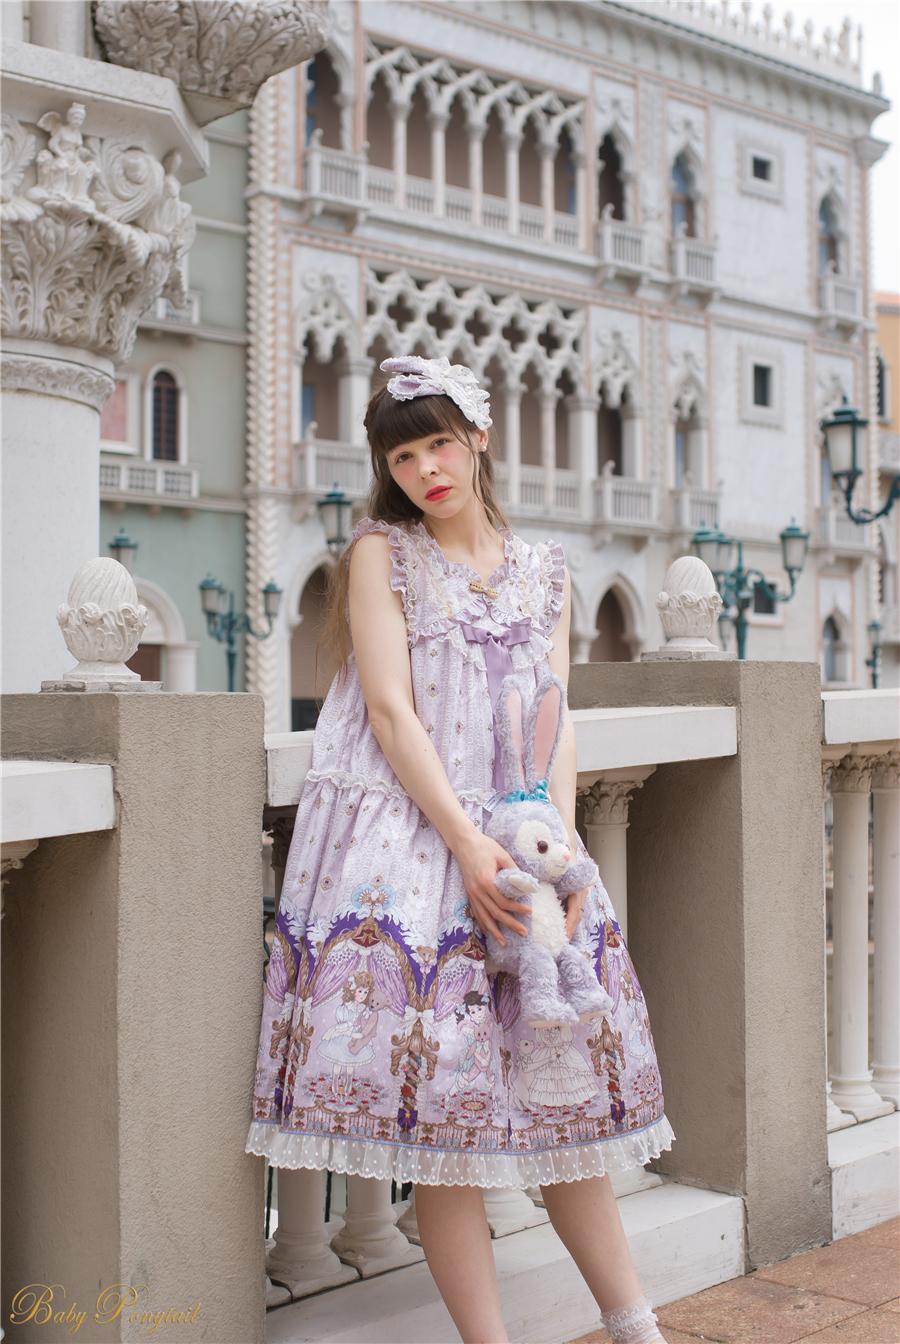 BabyPonytail_Model Preview_My Favorite Companion_Purple JSK_NG-2_Claudia_04.jpg